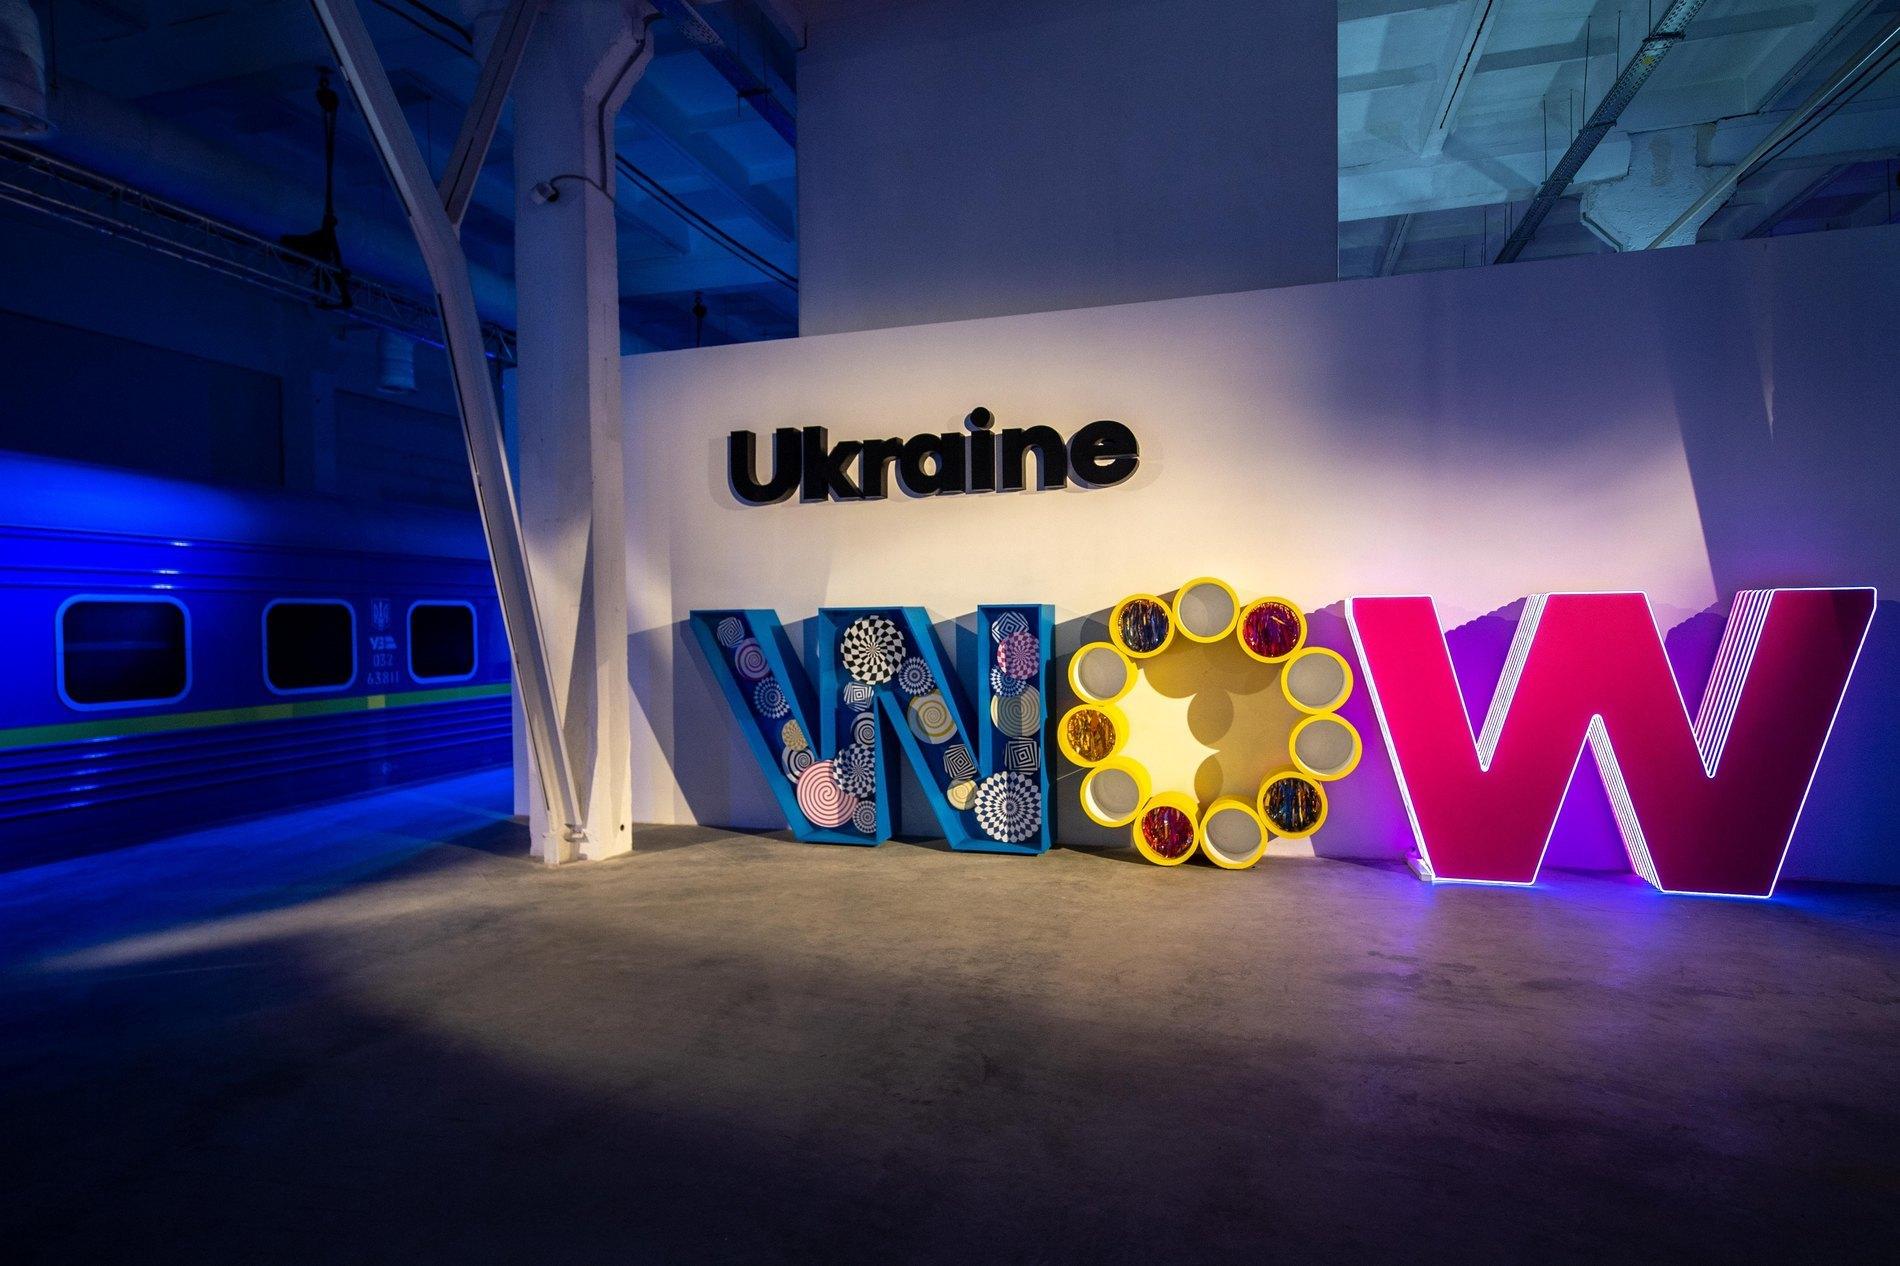 Ukraine WOW LhDn0aHjFcFVhf_Zo8KsqA